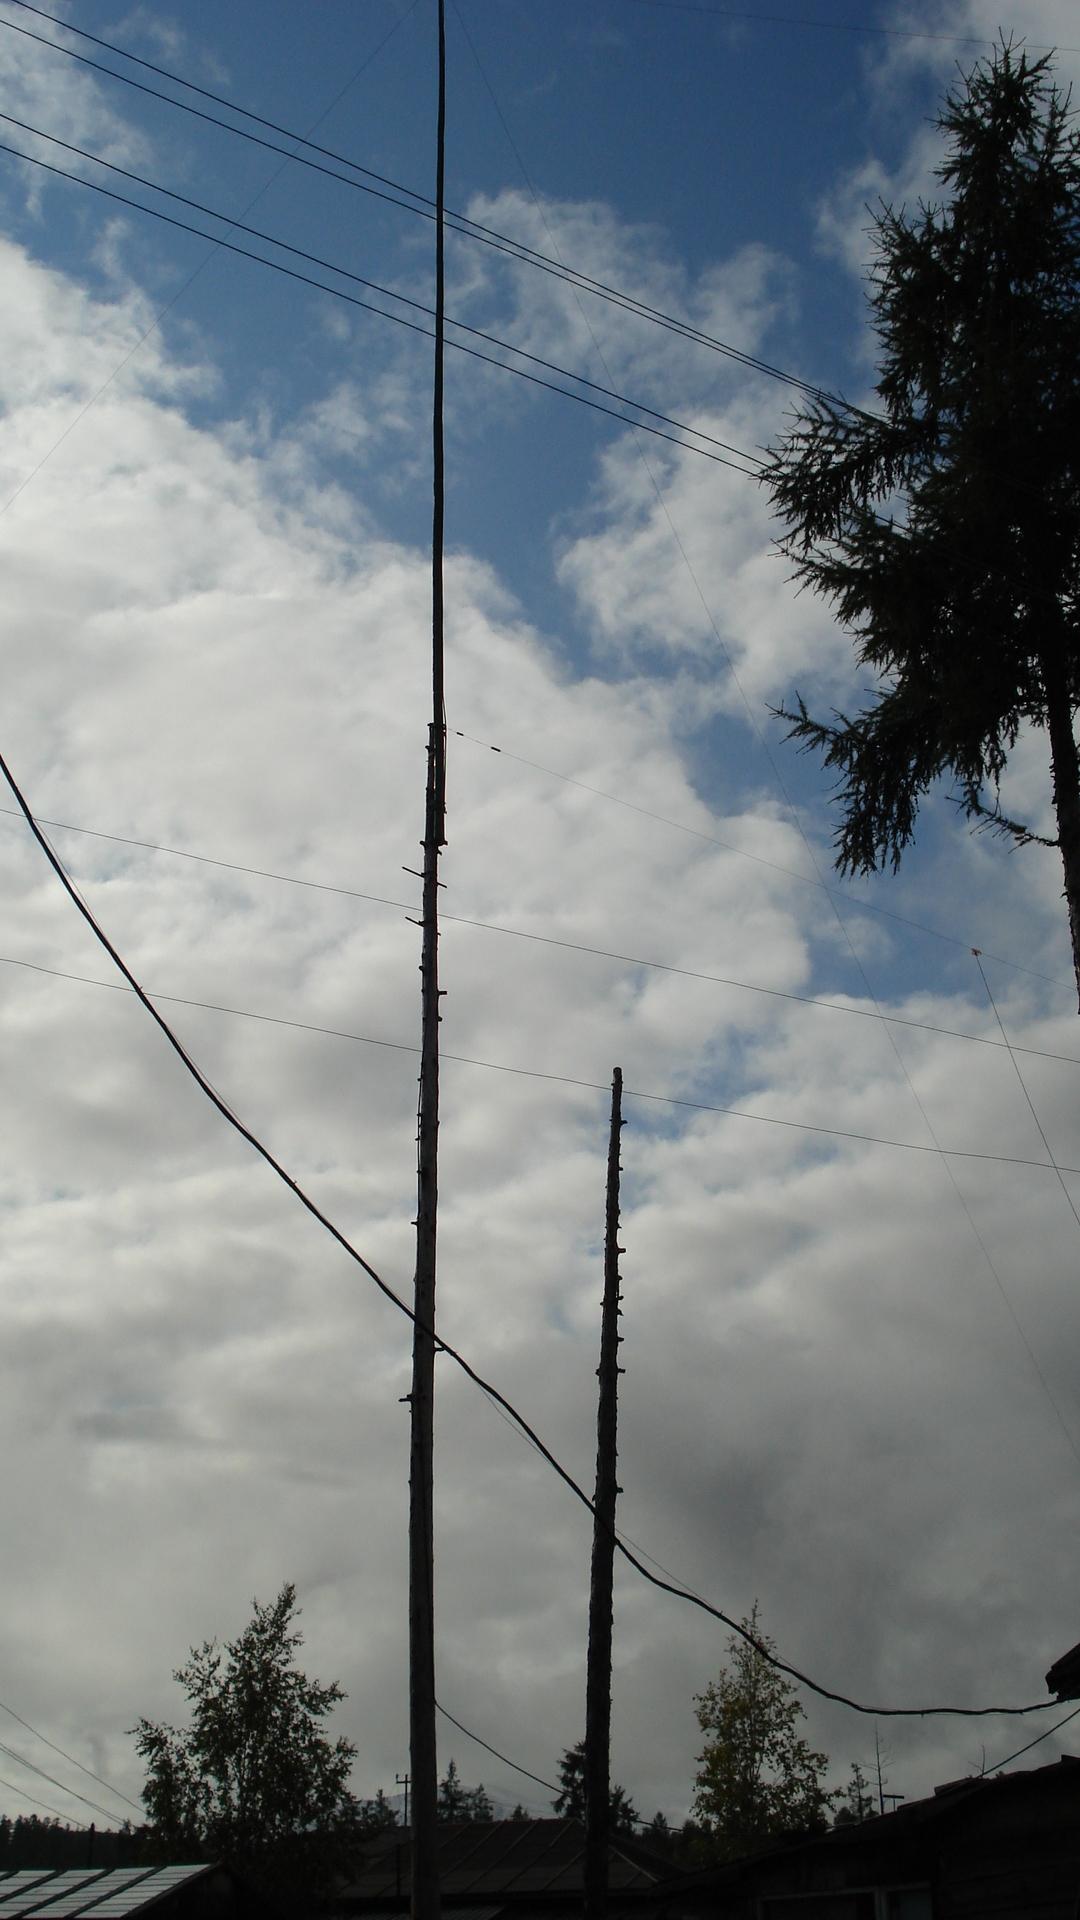 members/21760-rt1s-album429-picture204942-antena-160-80m.jpg